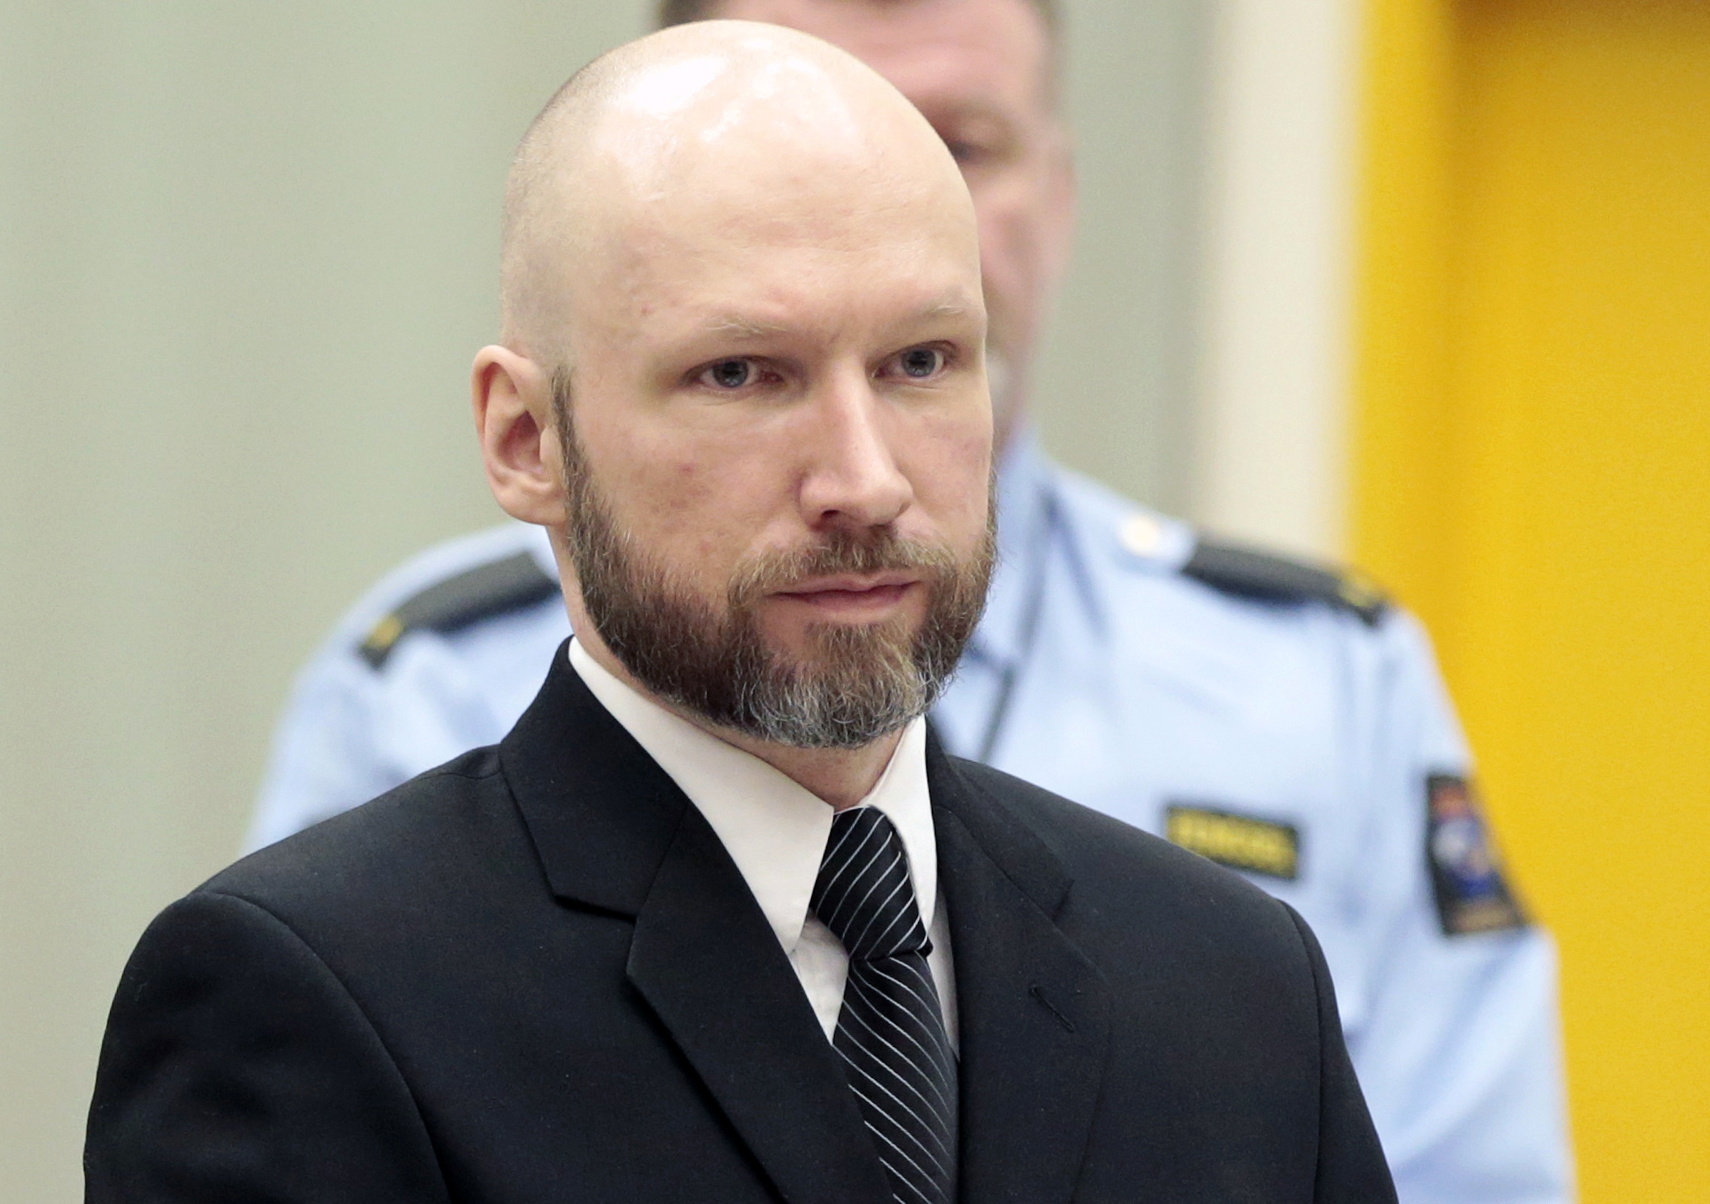 Anders Bering Brejvik, Utoja